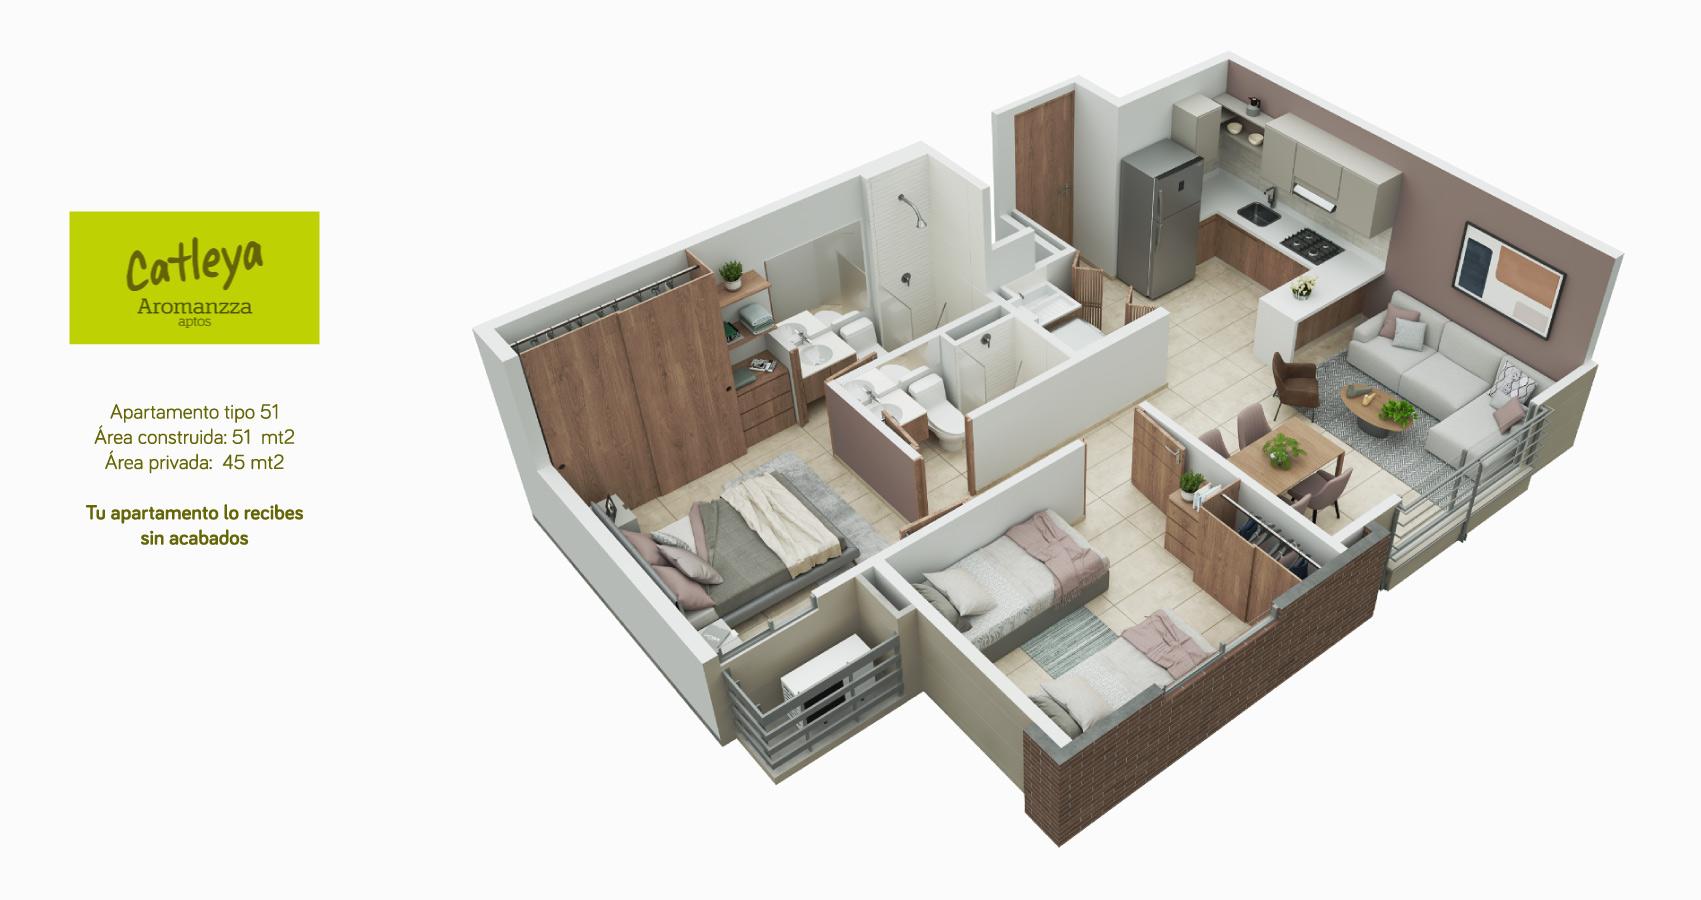 Apartamento tipo 51 Catleya - Aromanza